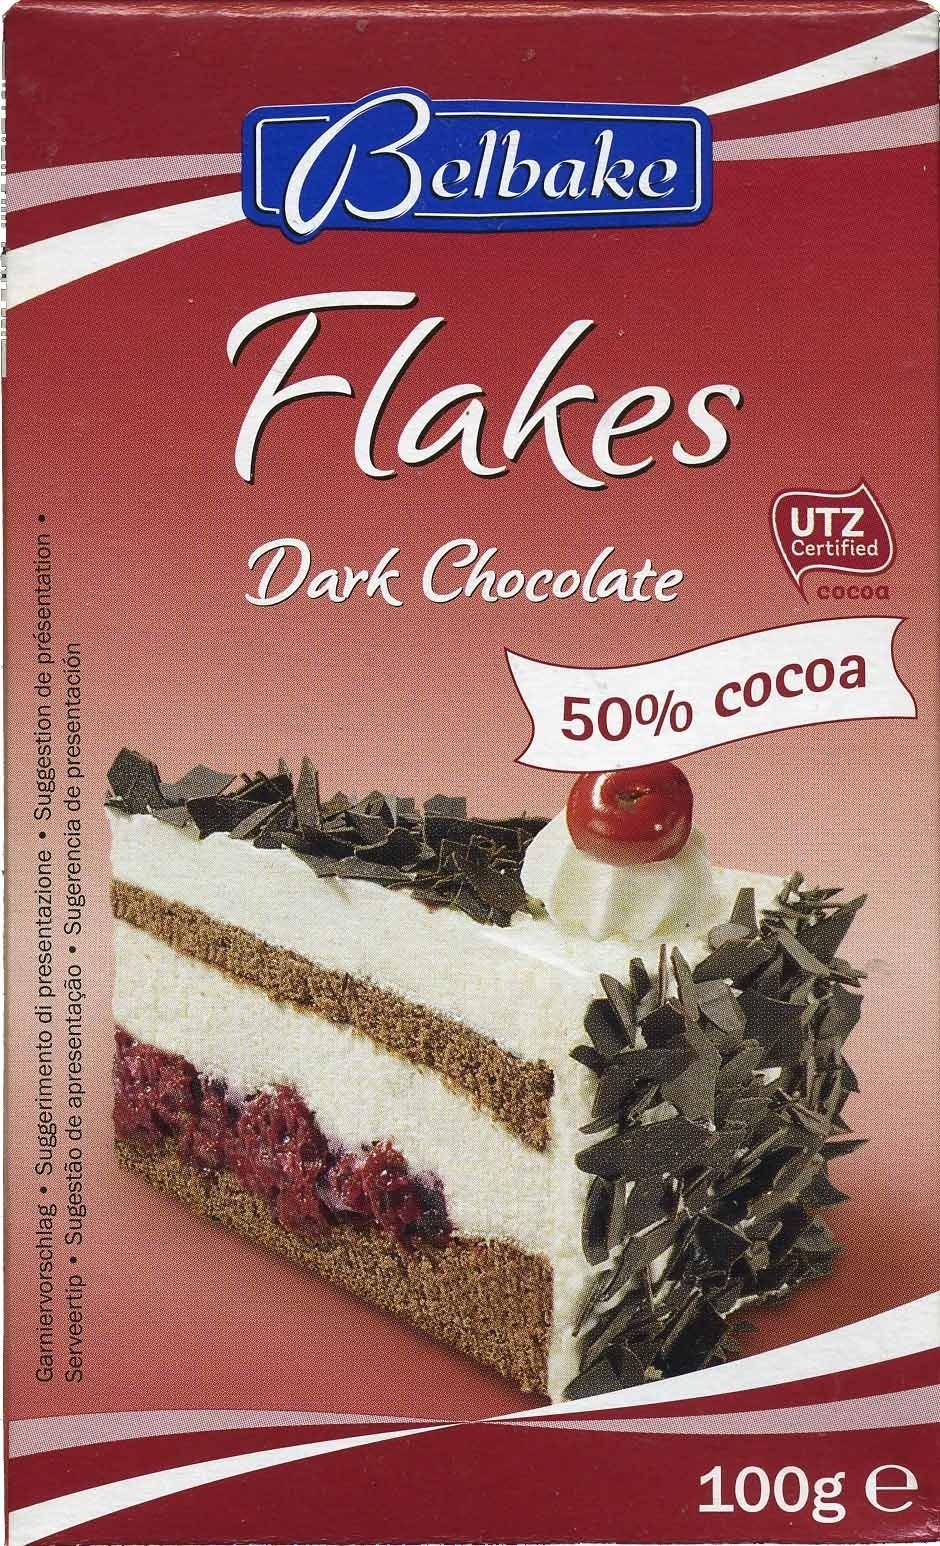 Dark chocolate flakes 50% cocoa - Product - es